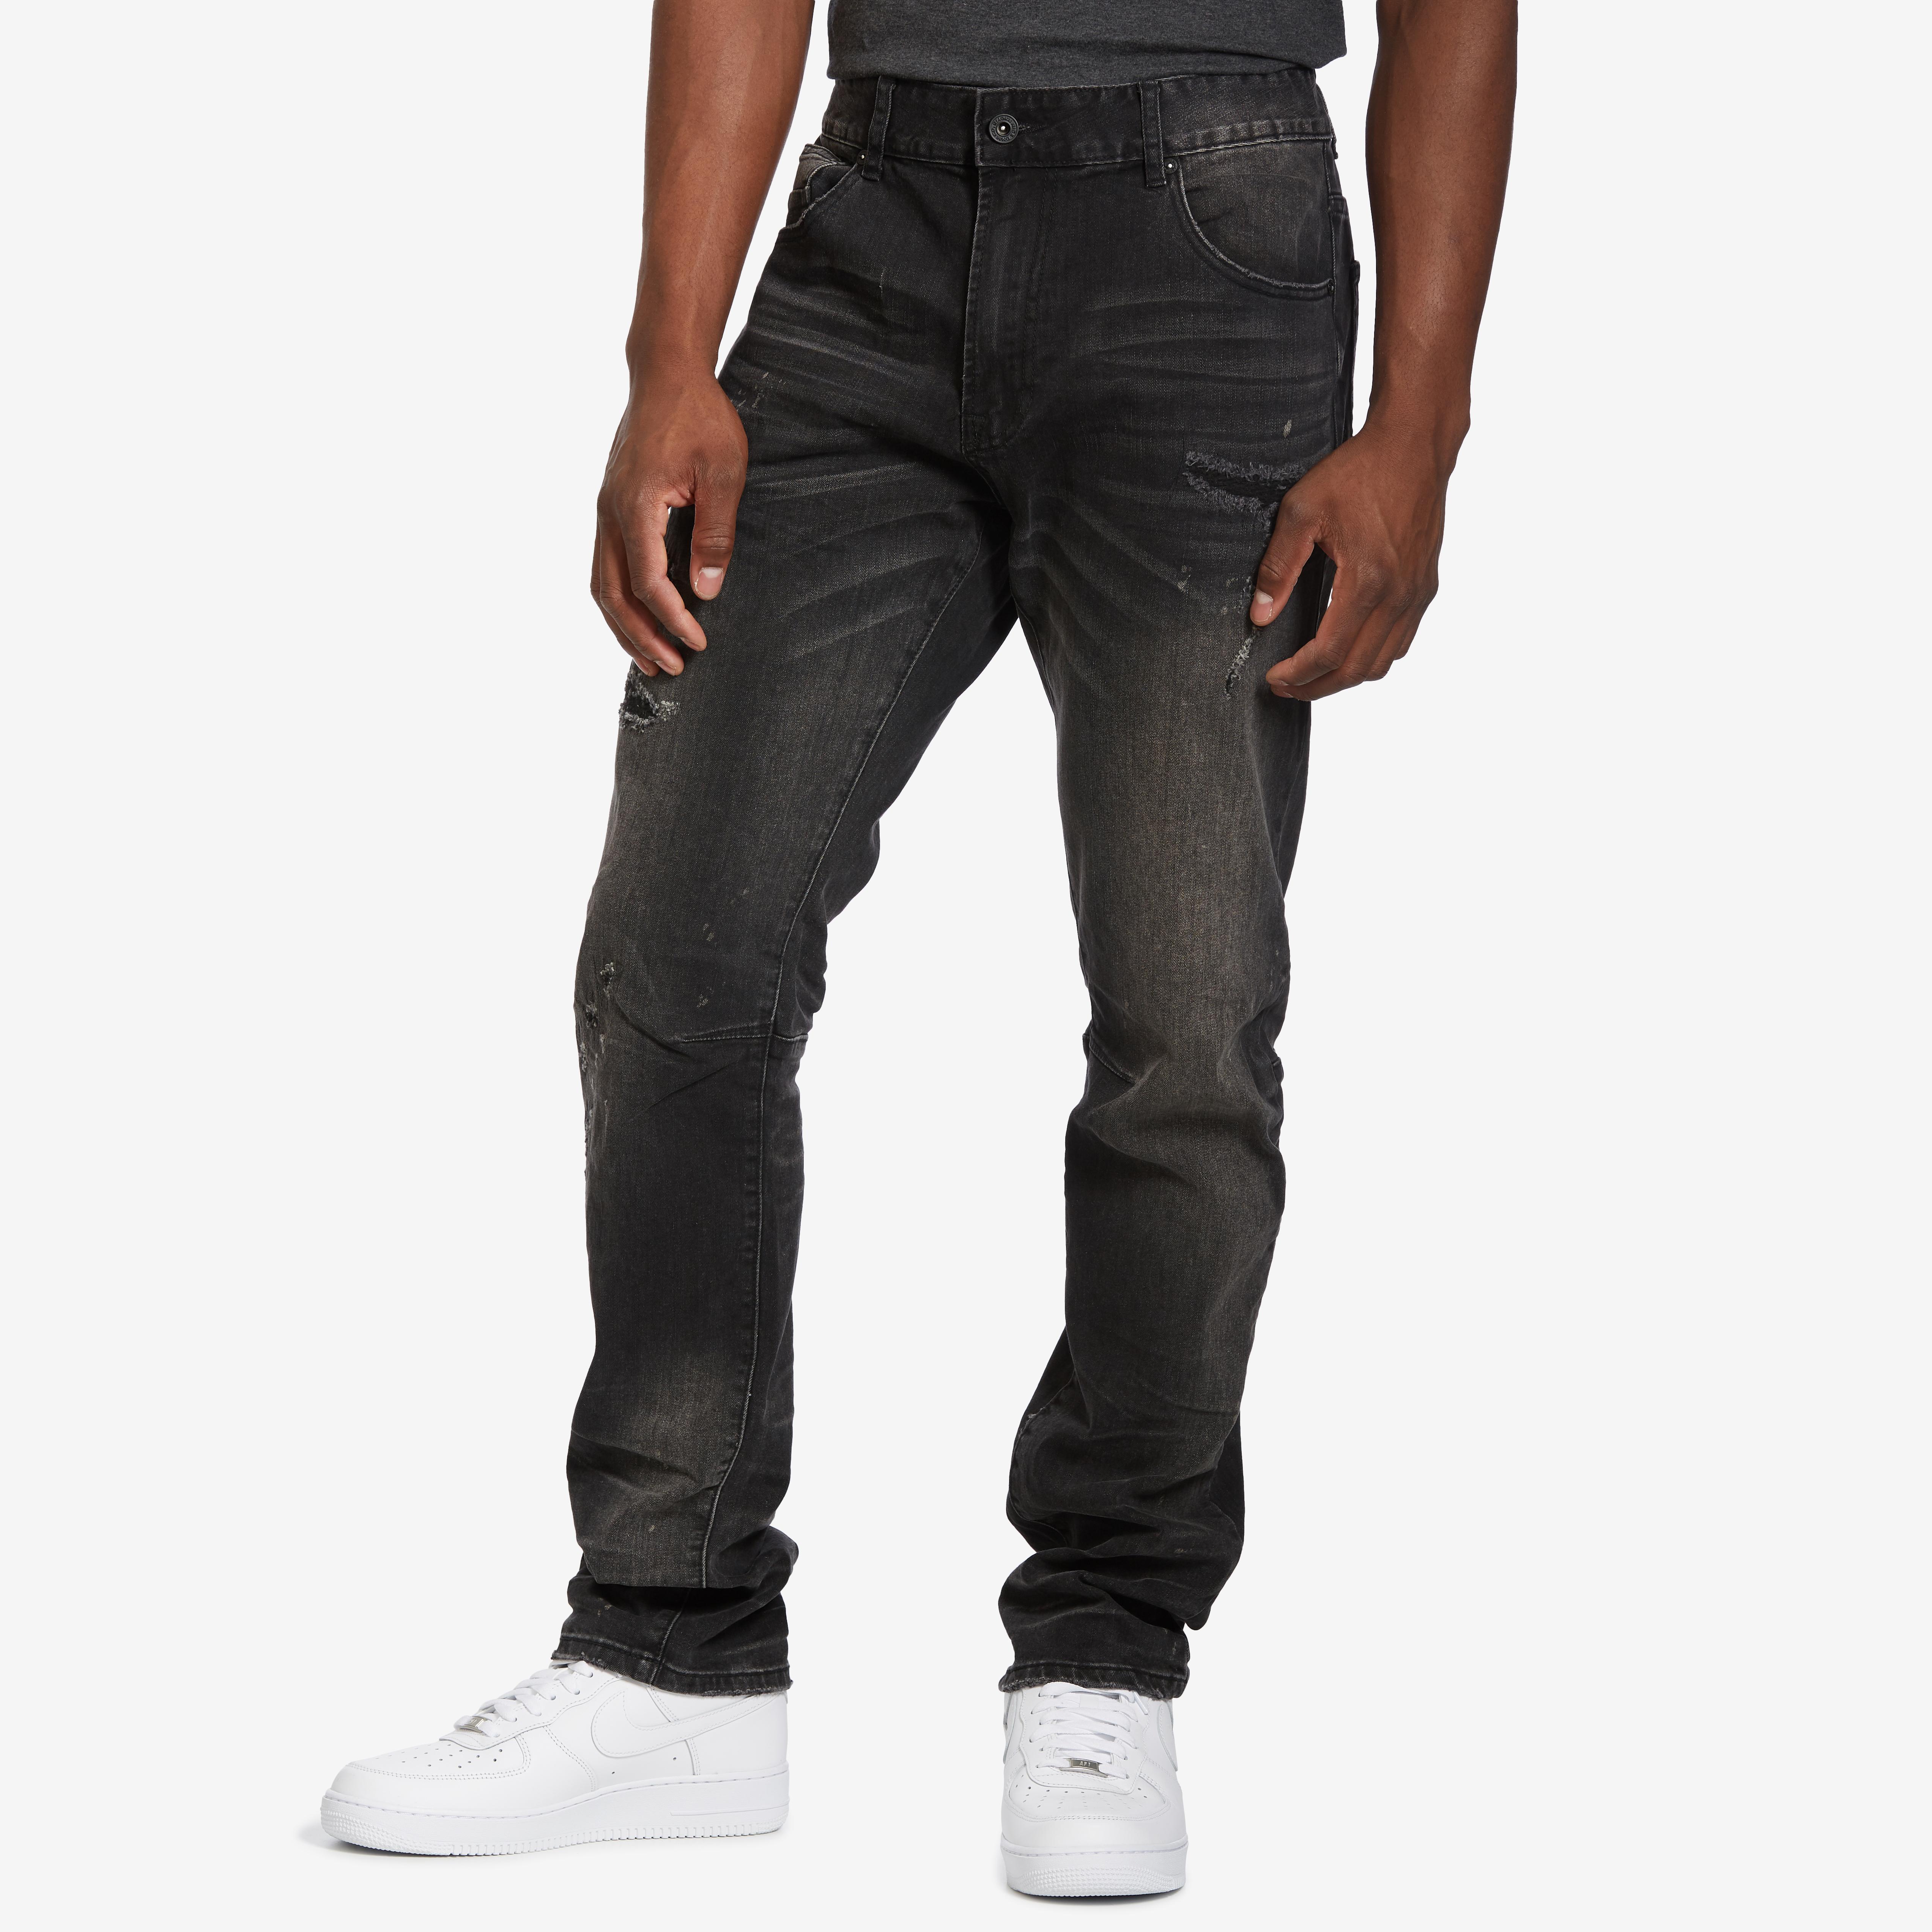 5 Pocket Blast Denim Jeans